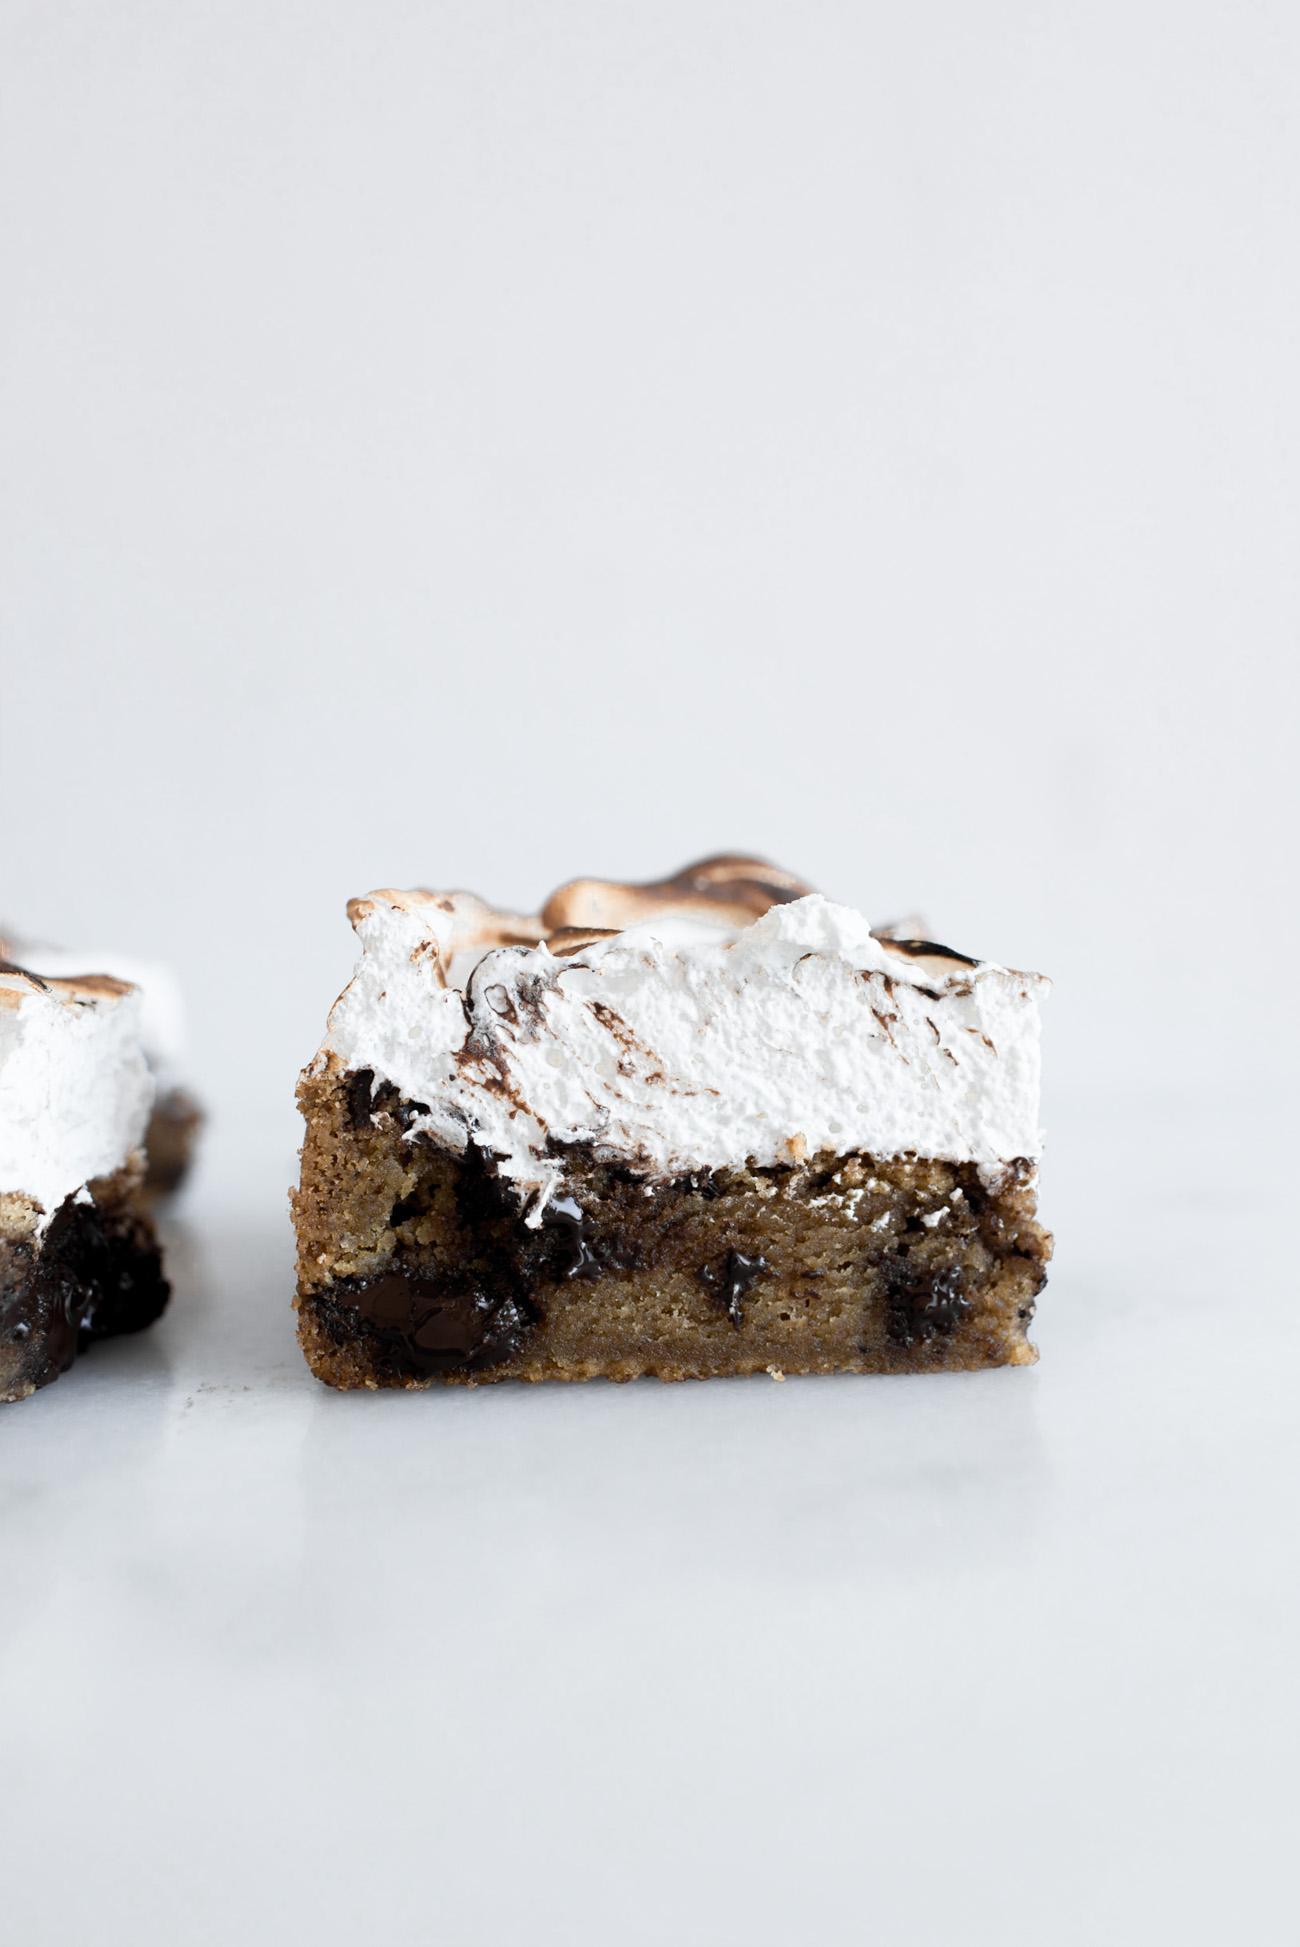 Brown-Butter-Cookie-Meringue-Bars-with-Espresso-Fleur-de-Sel-4.jpg